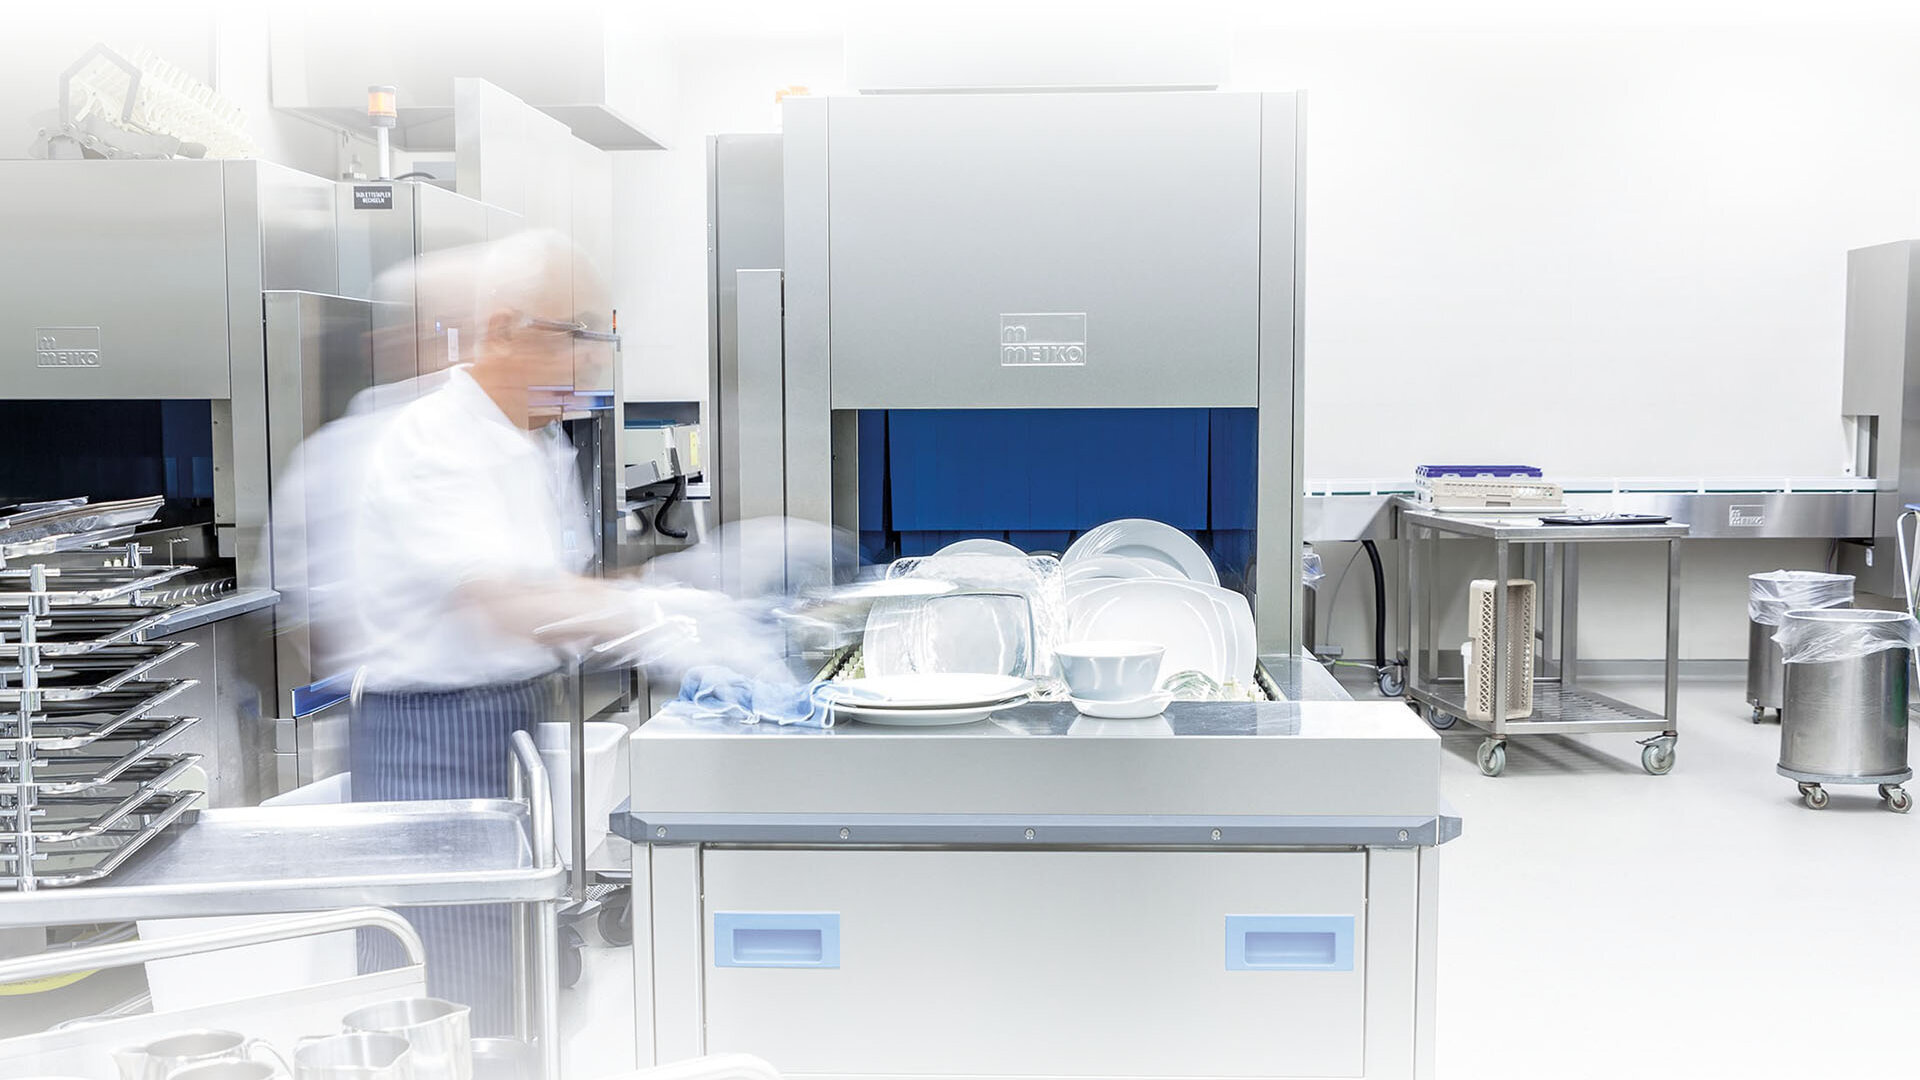 rack type dishwashing machine M-iQ